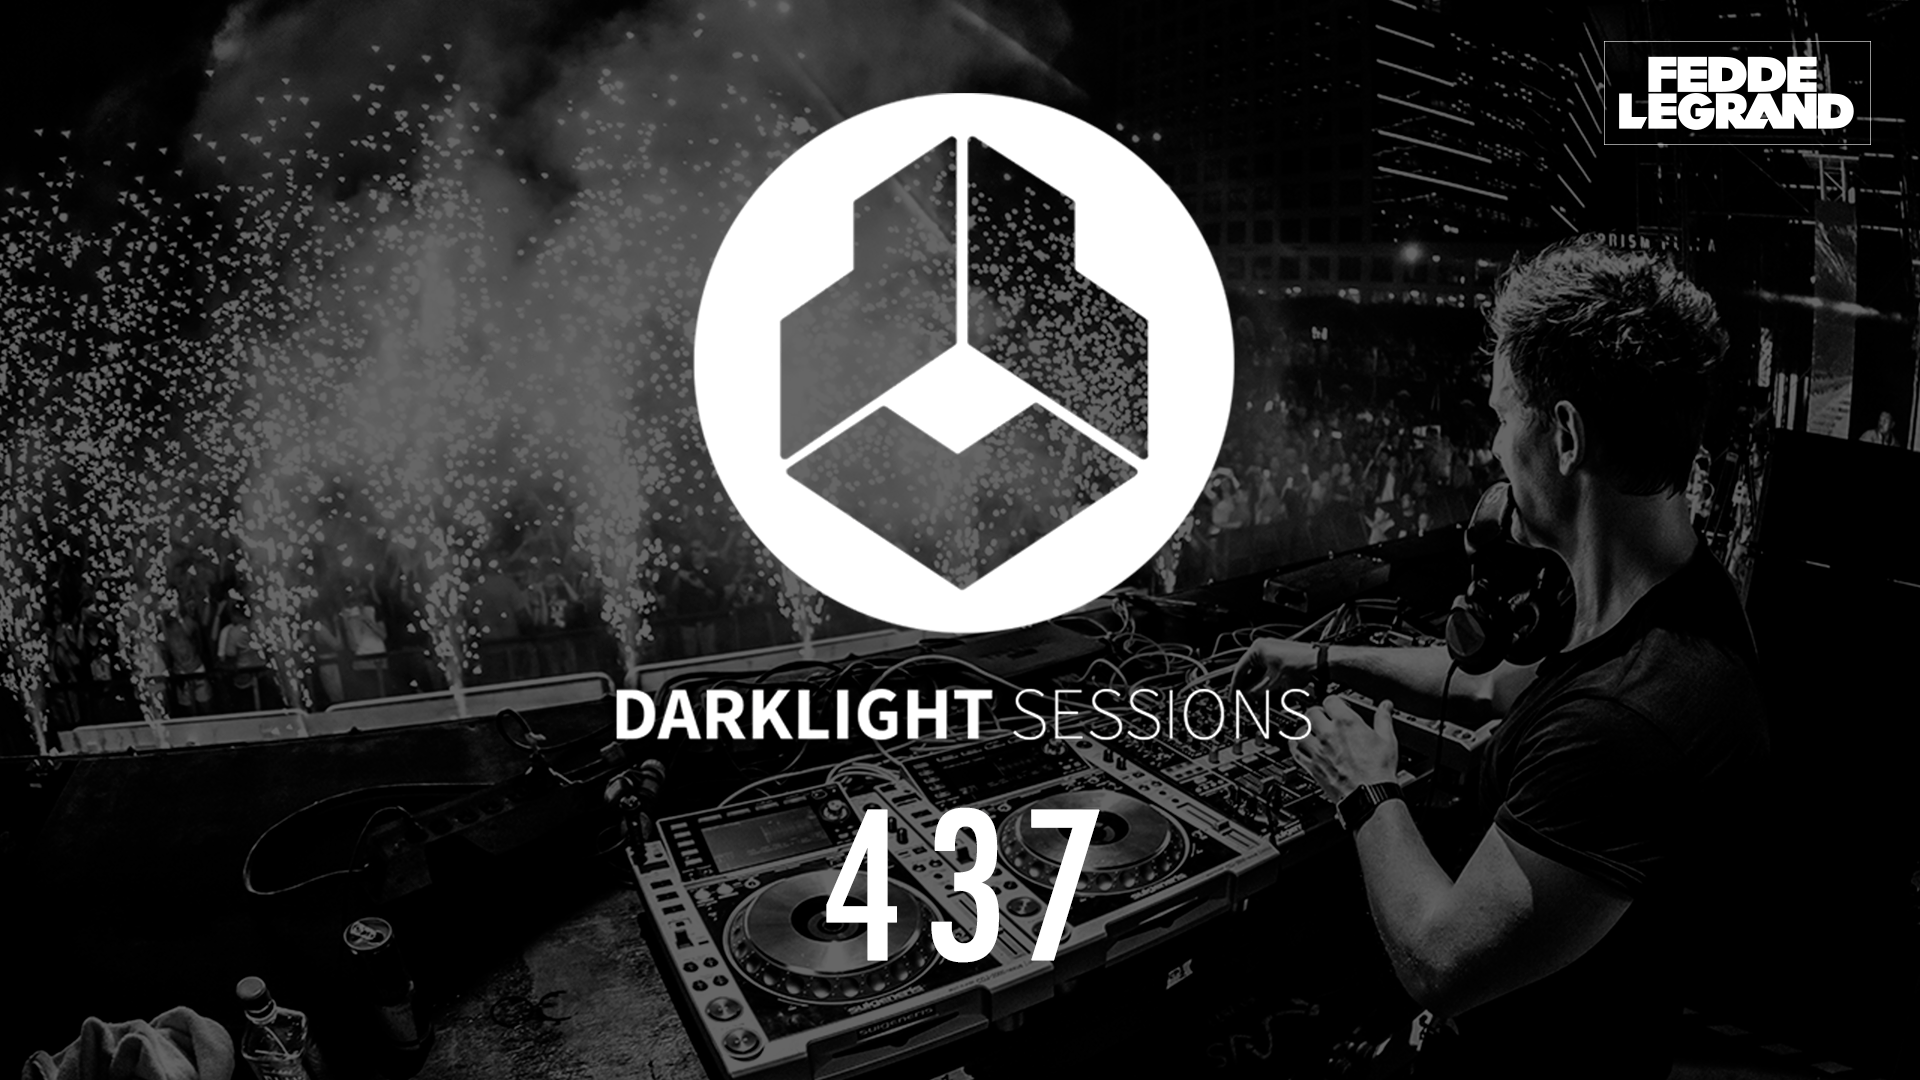 Darklight Sessions 437